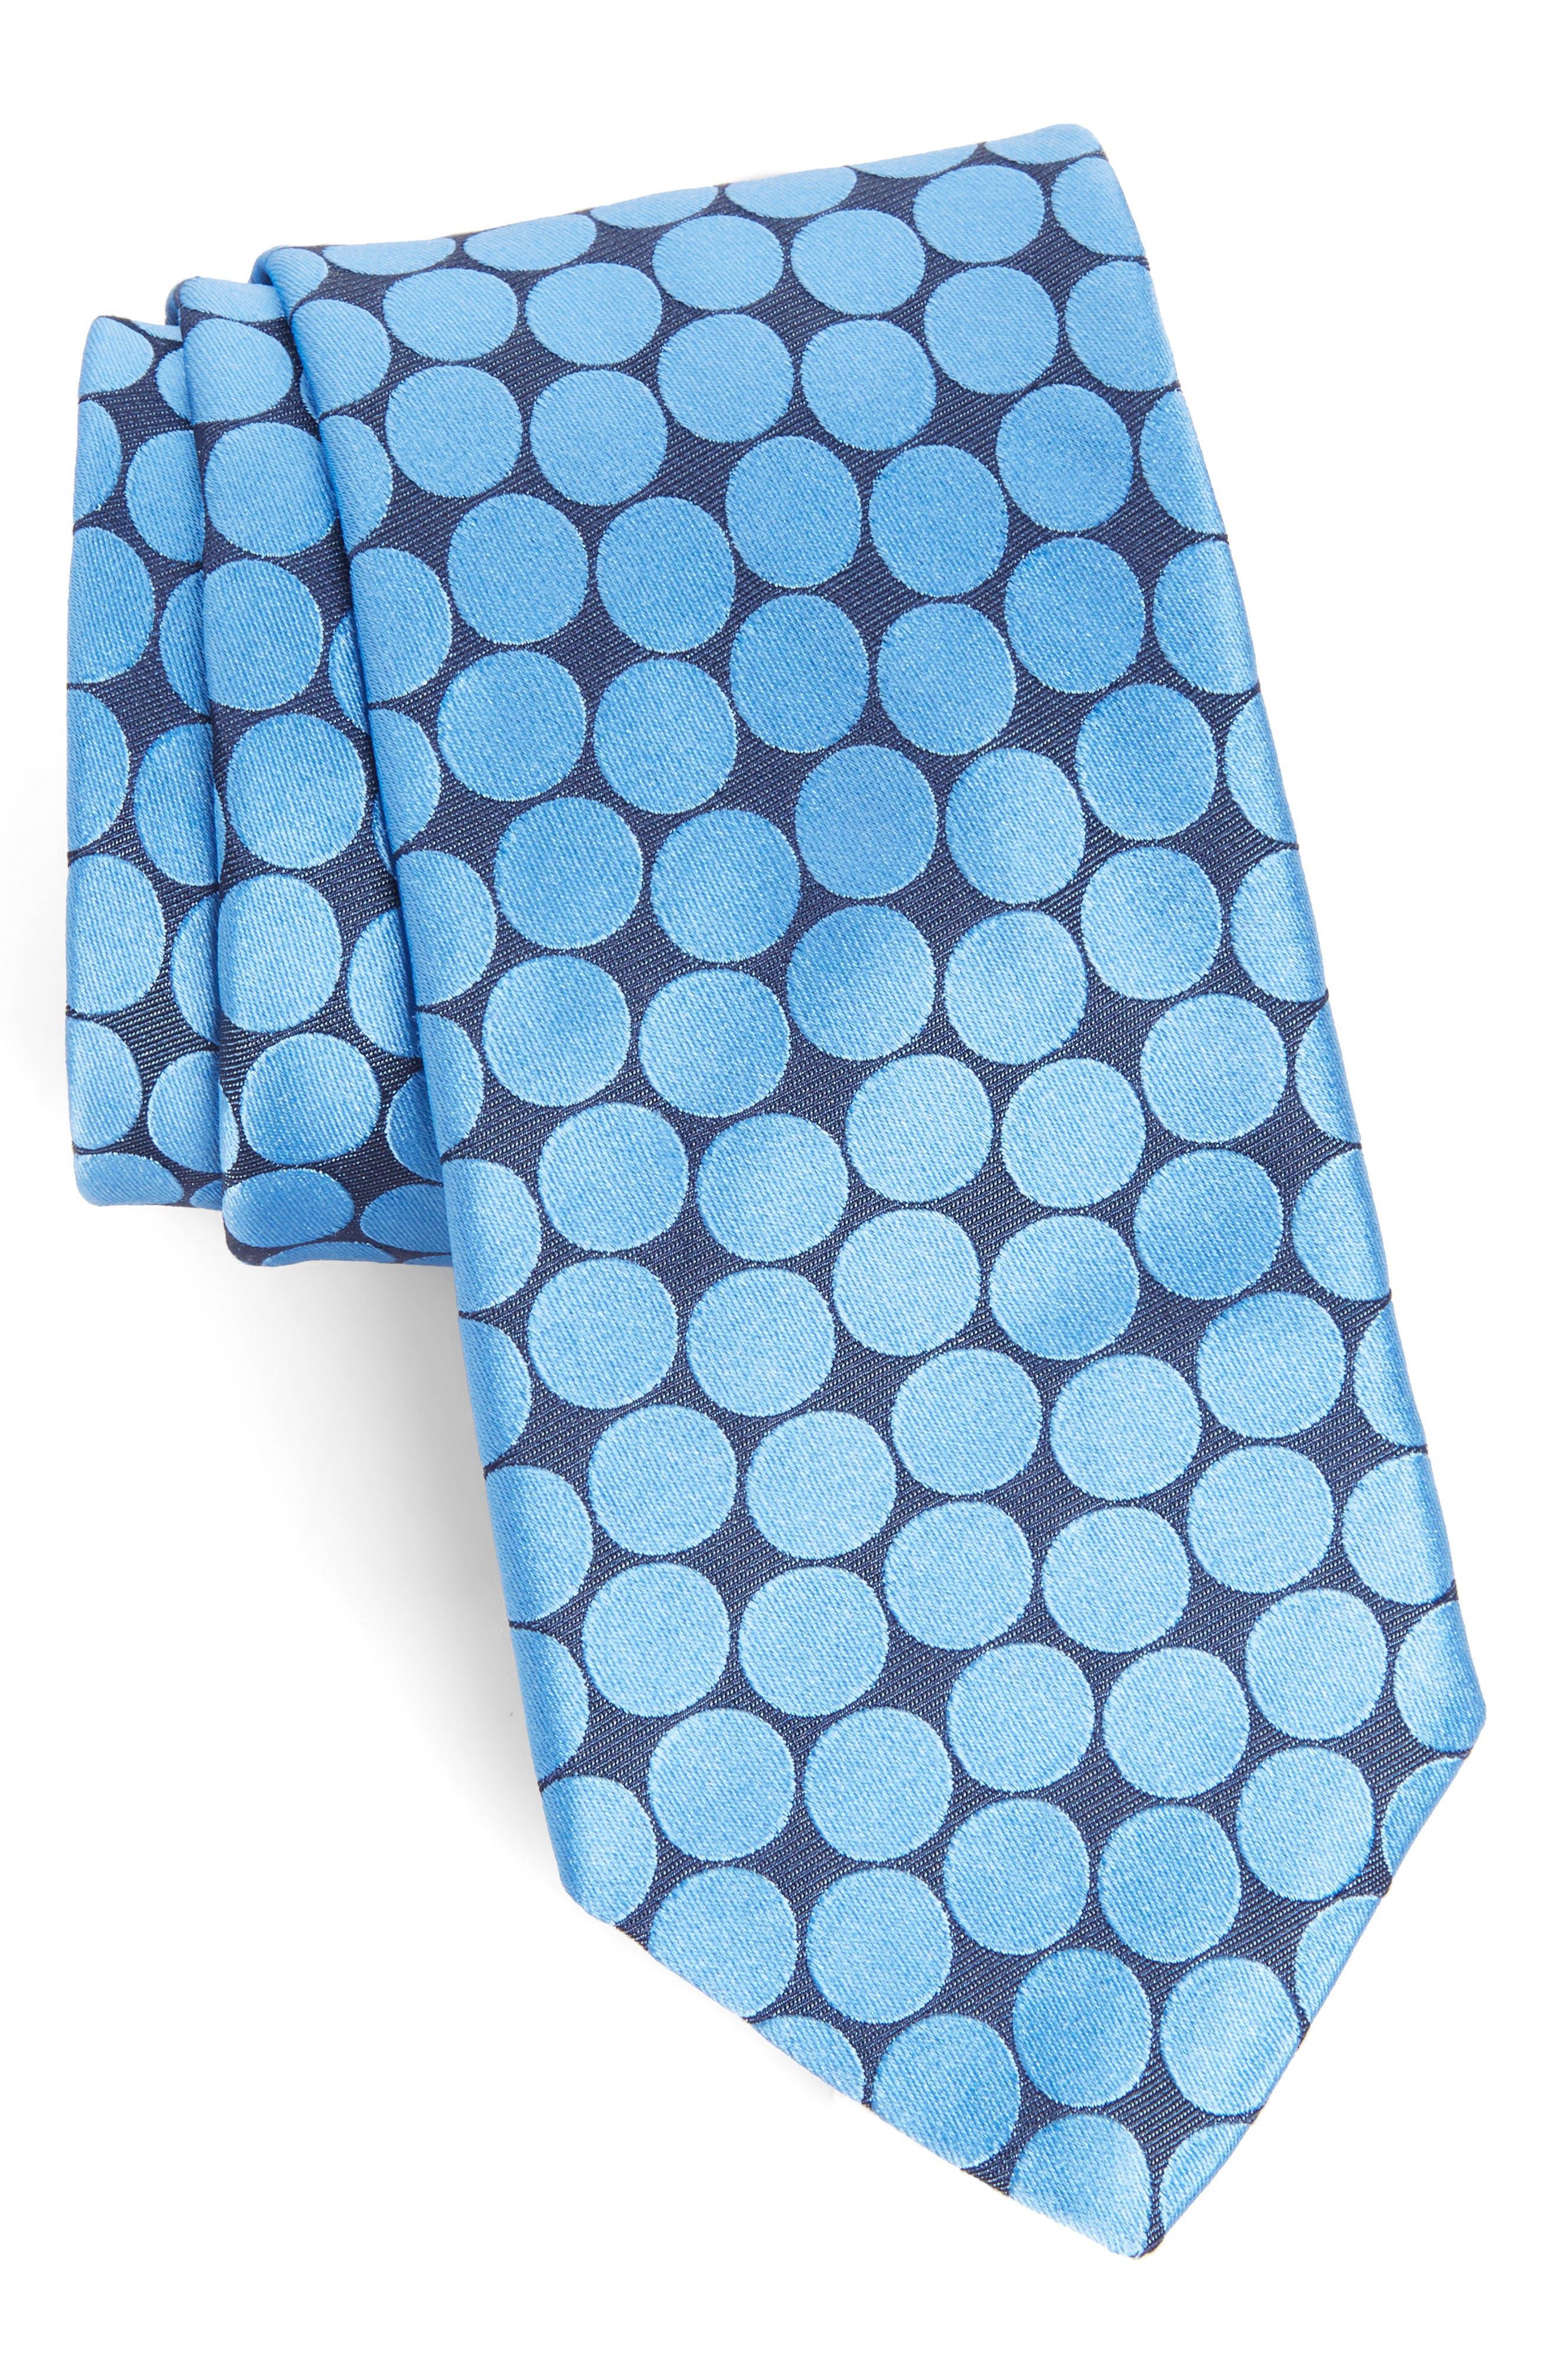 Alternate Image 1 Selected - Ted Baker London Spots II Silk Tie